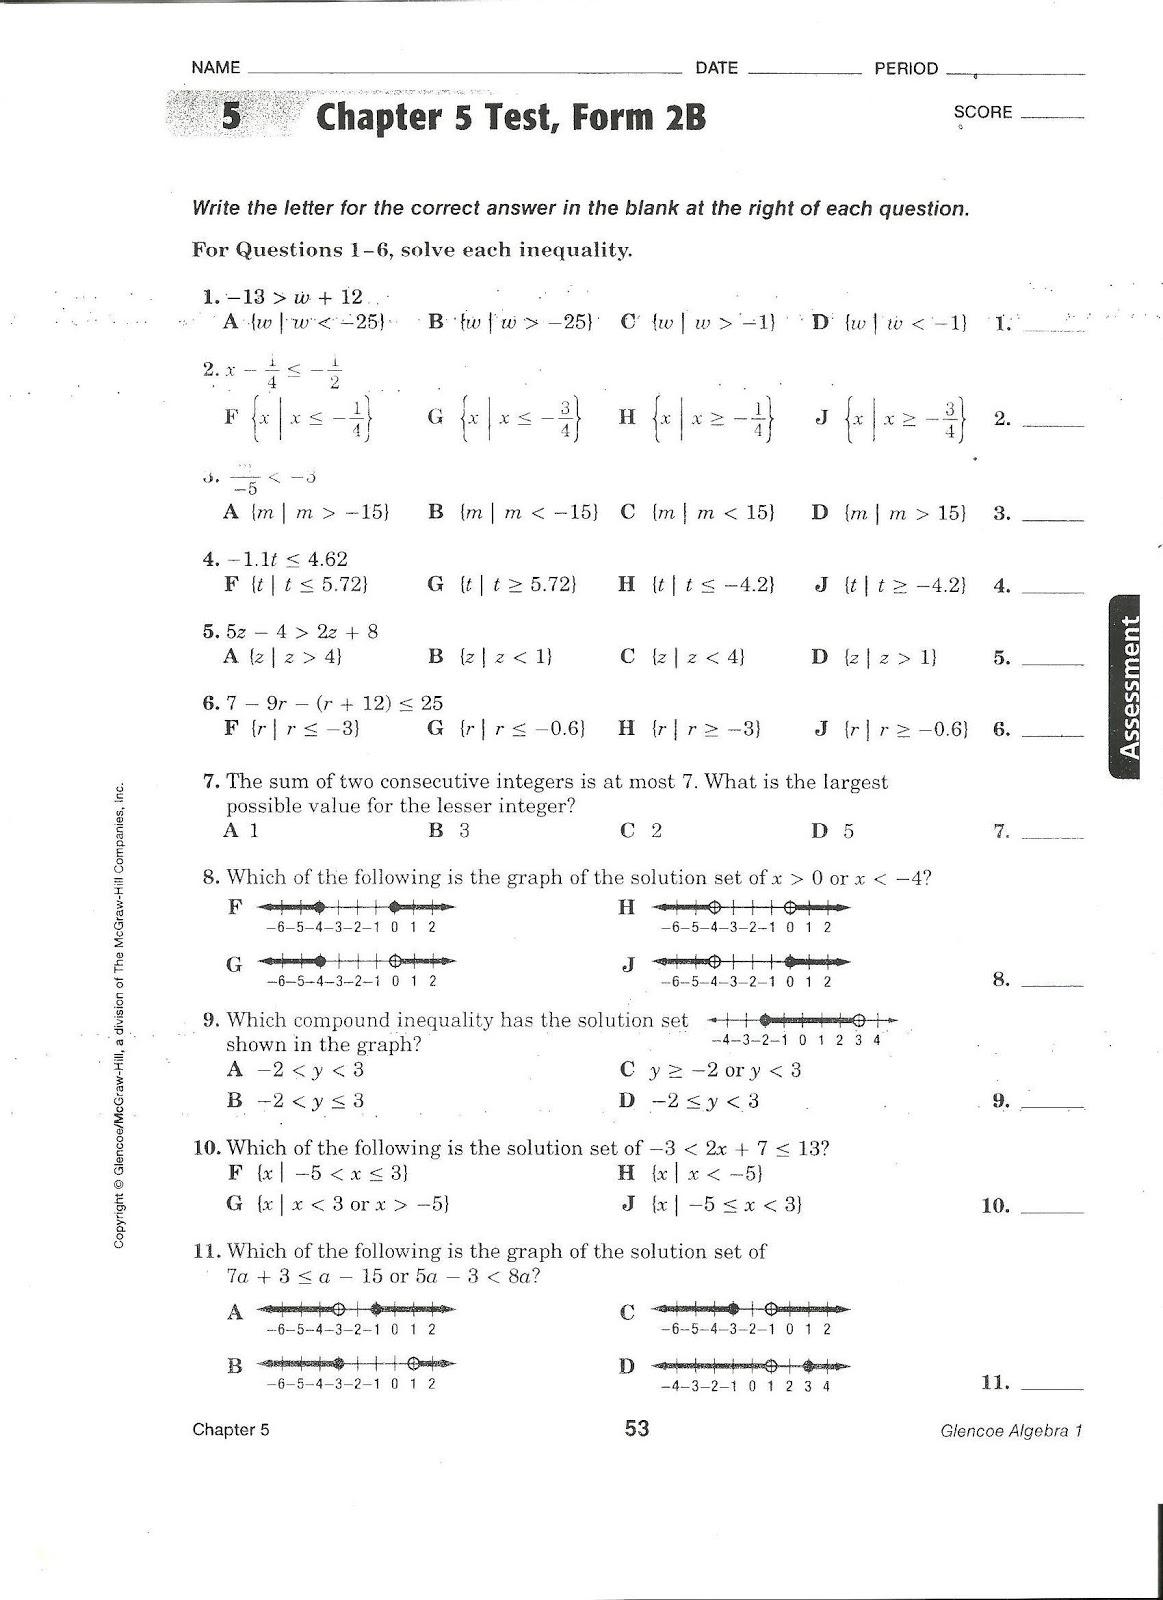 Printables Glencoe Algebra 1 Worksheet Answers algebra 2 quiz answers html home work hall glencoe 1 chapter 7 test form 2a 2